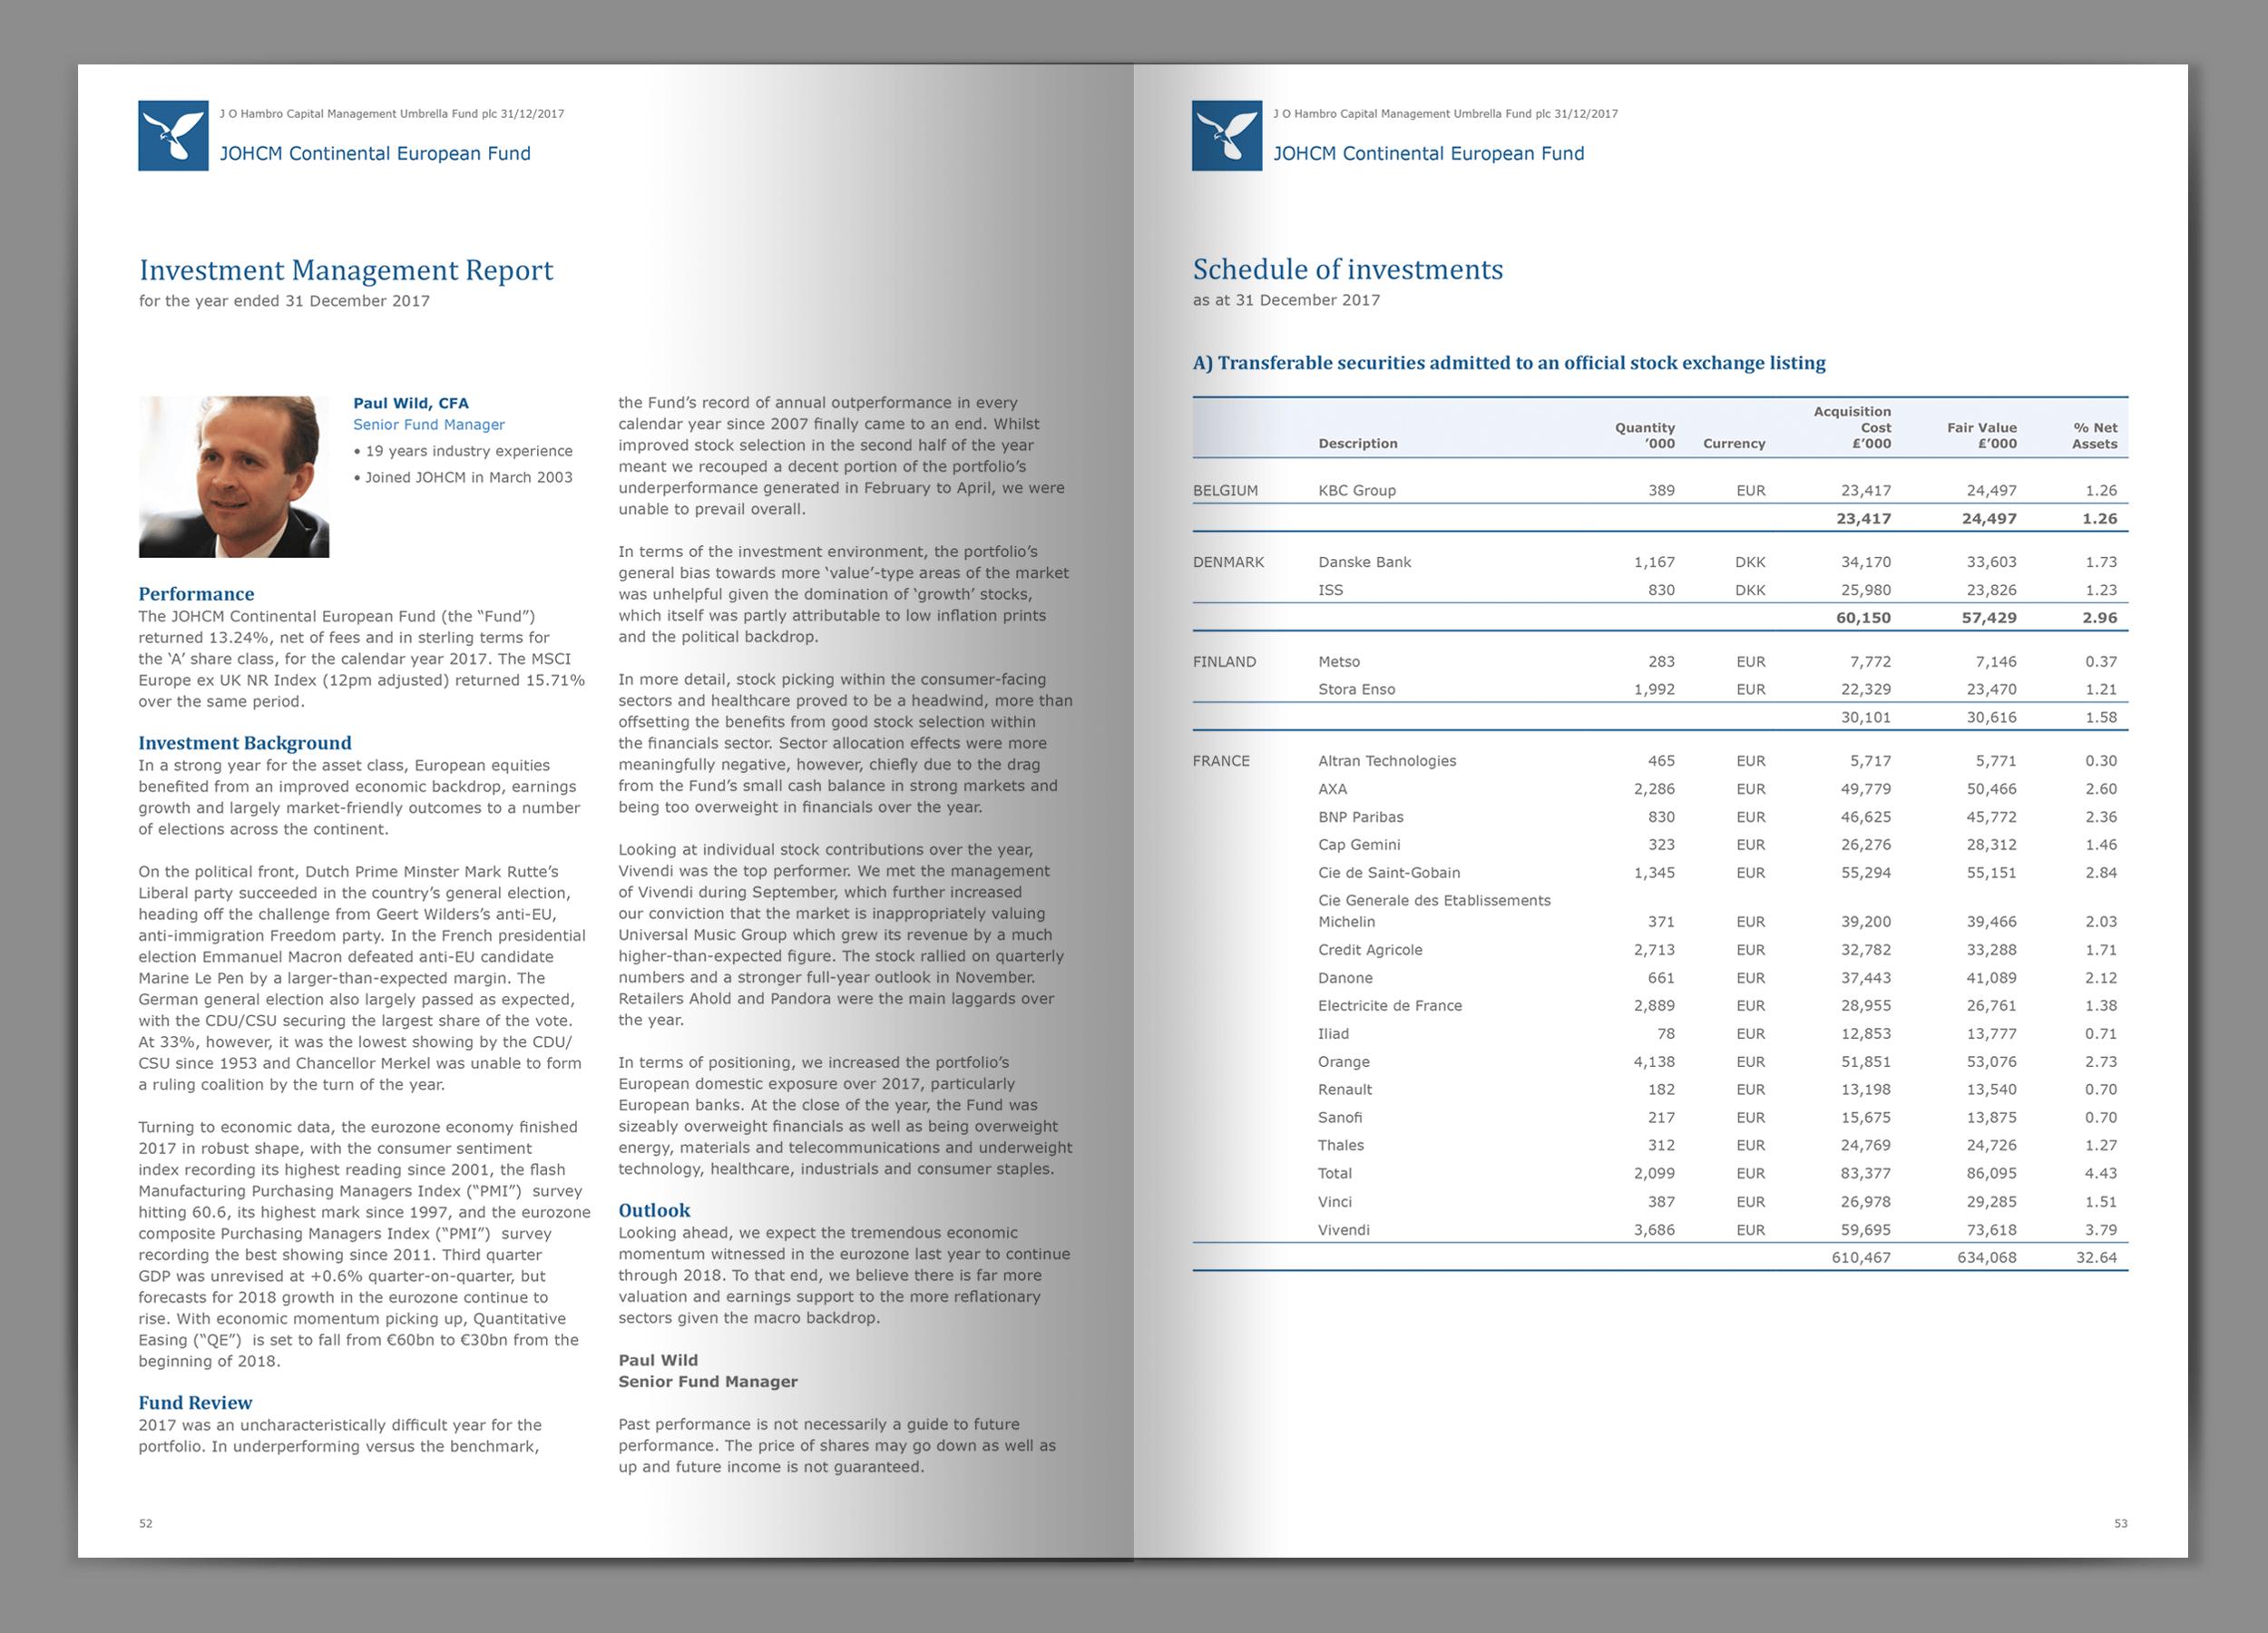 JOHCM Umbrella Fund plc